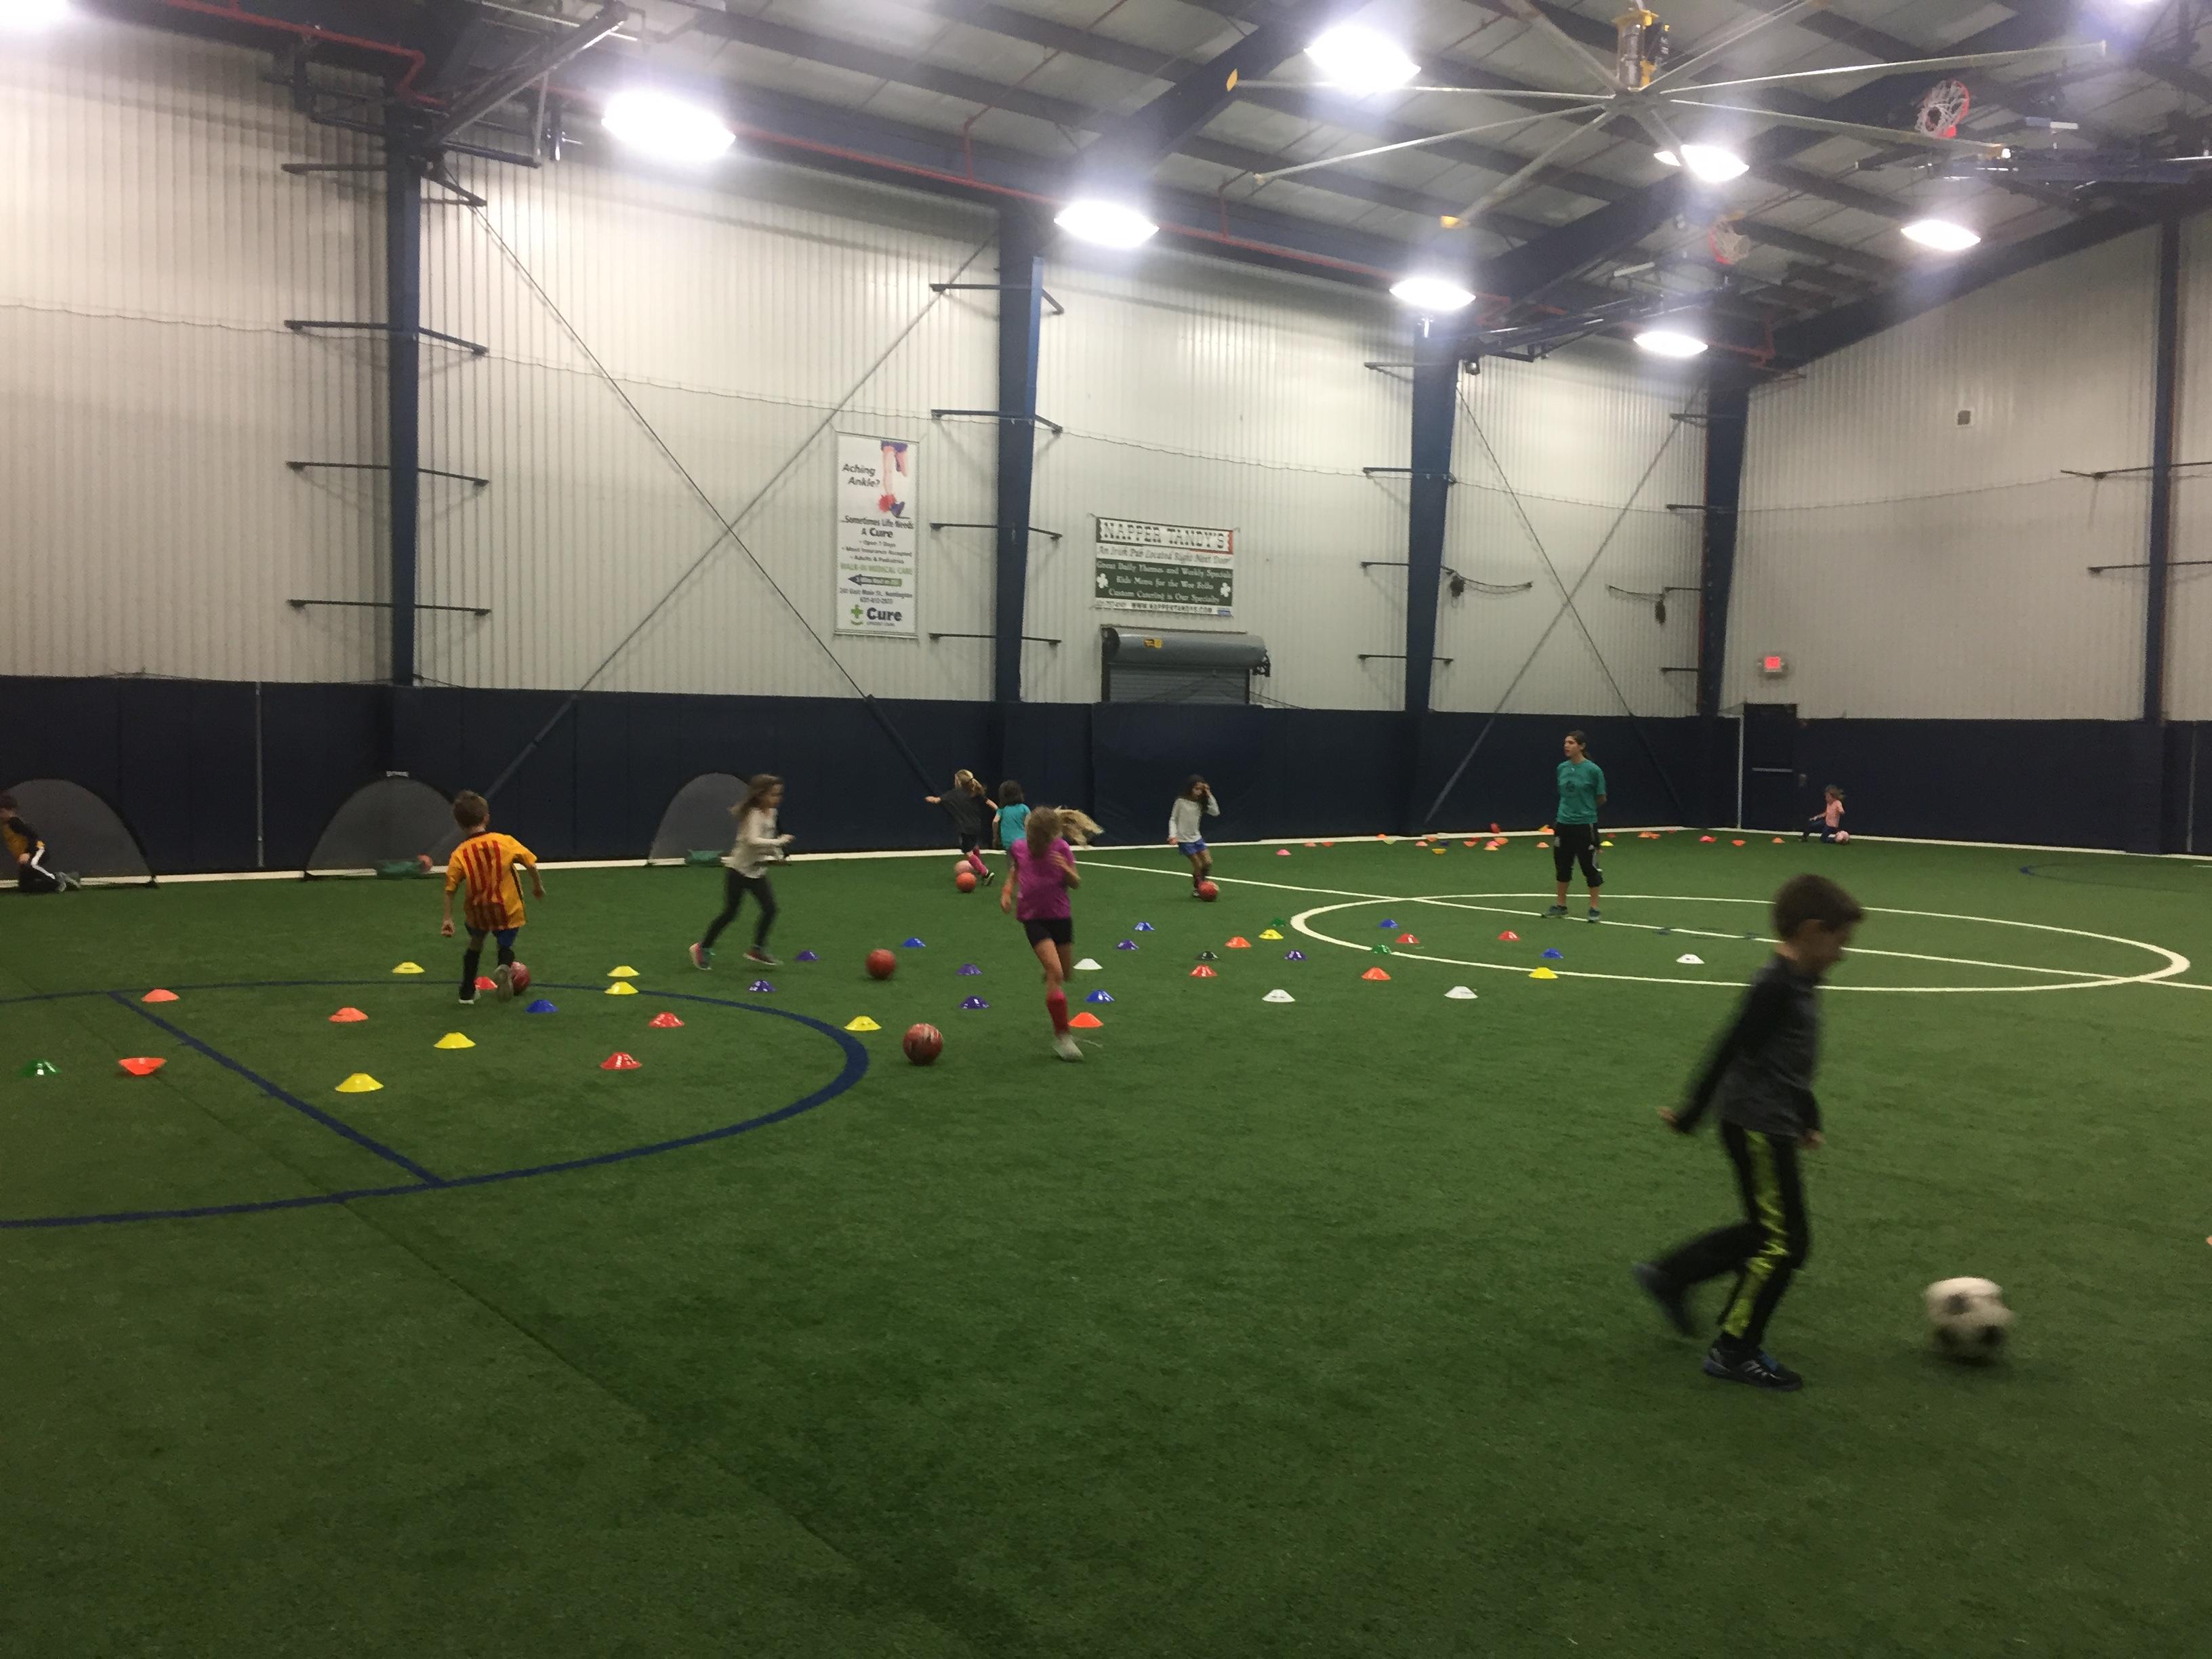 Intramural Soccer Training